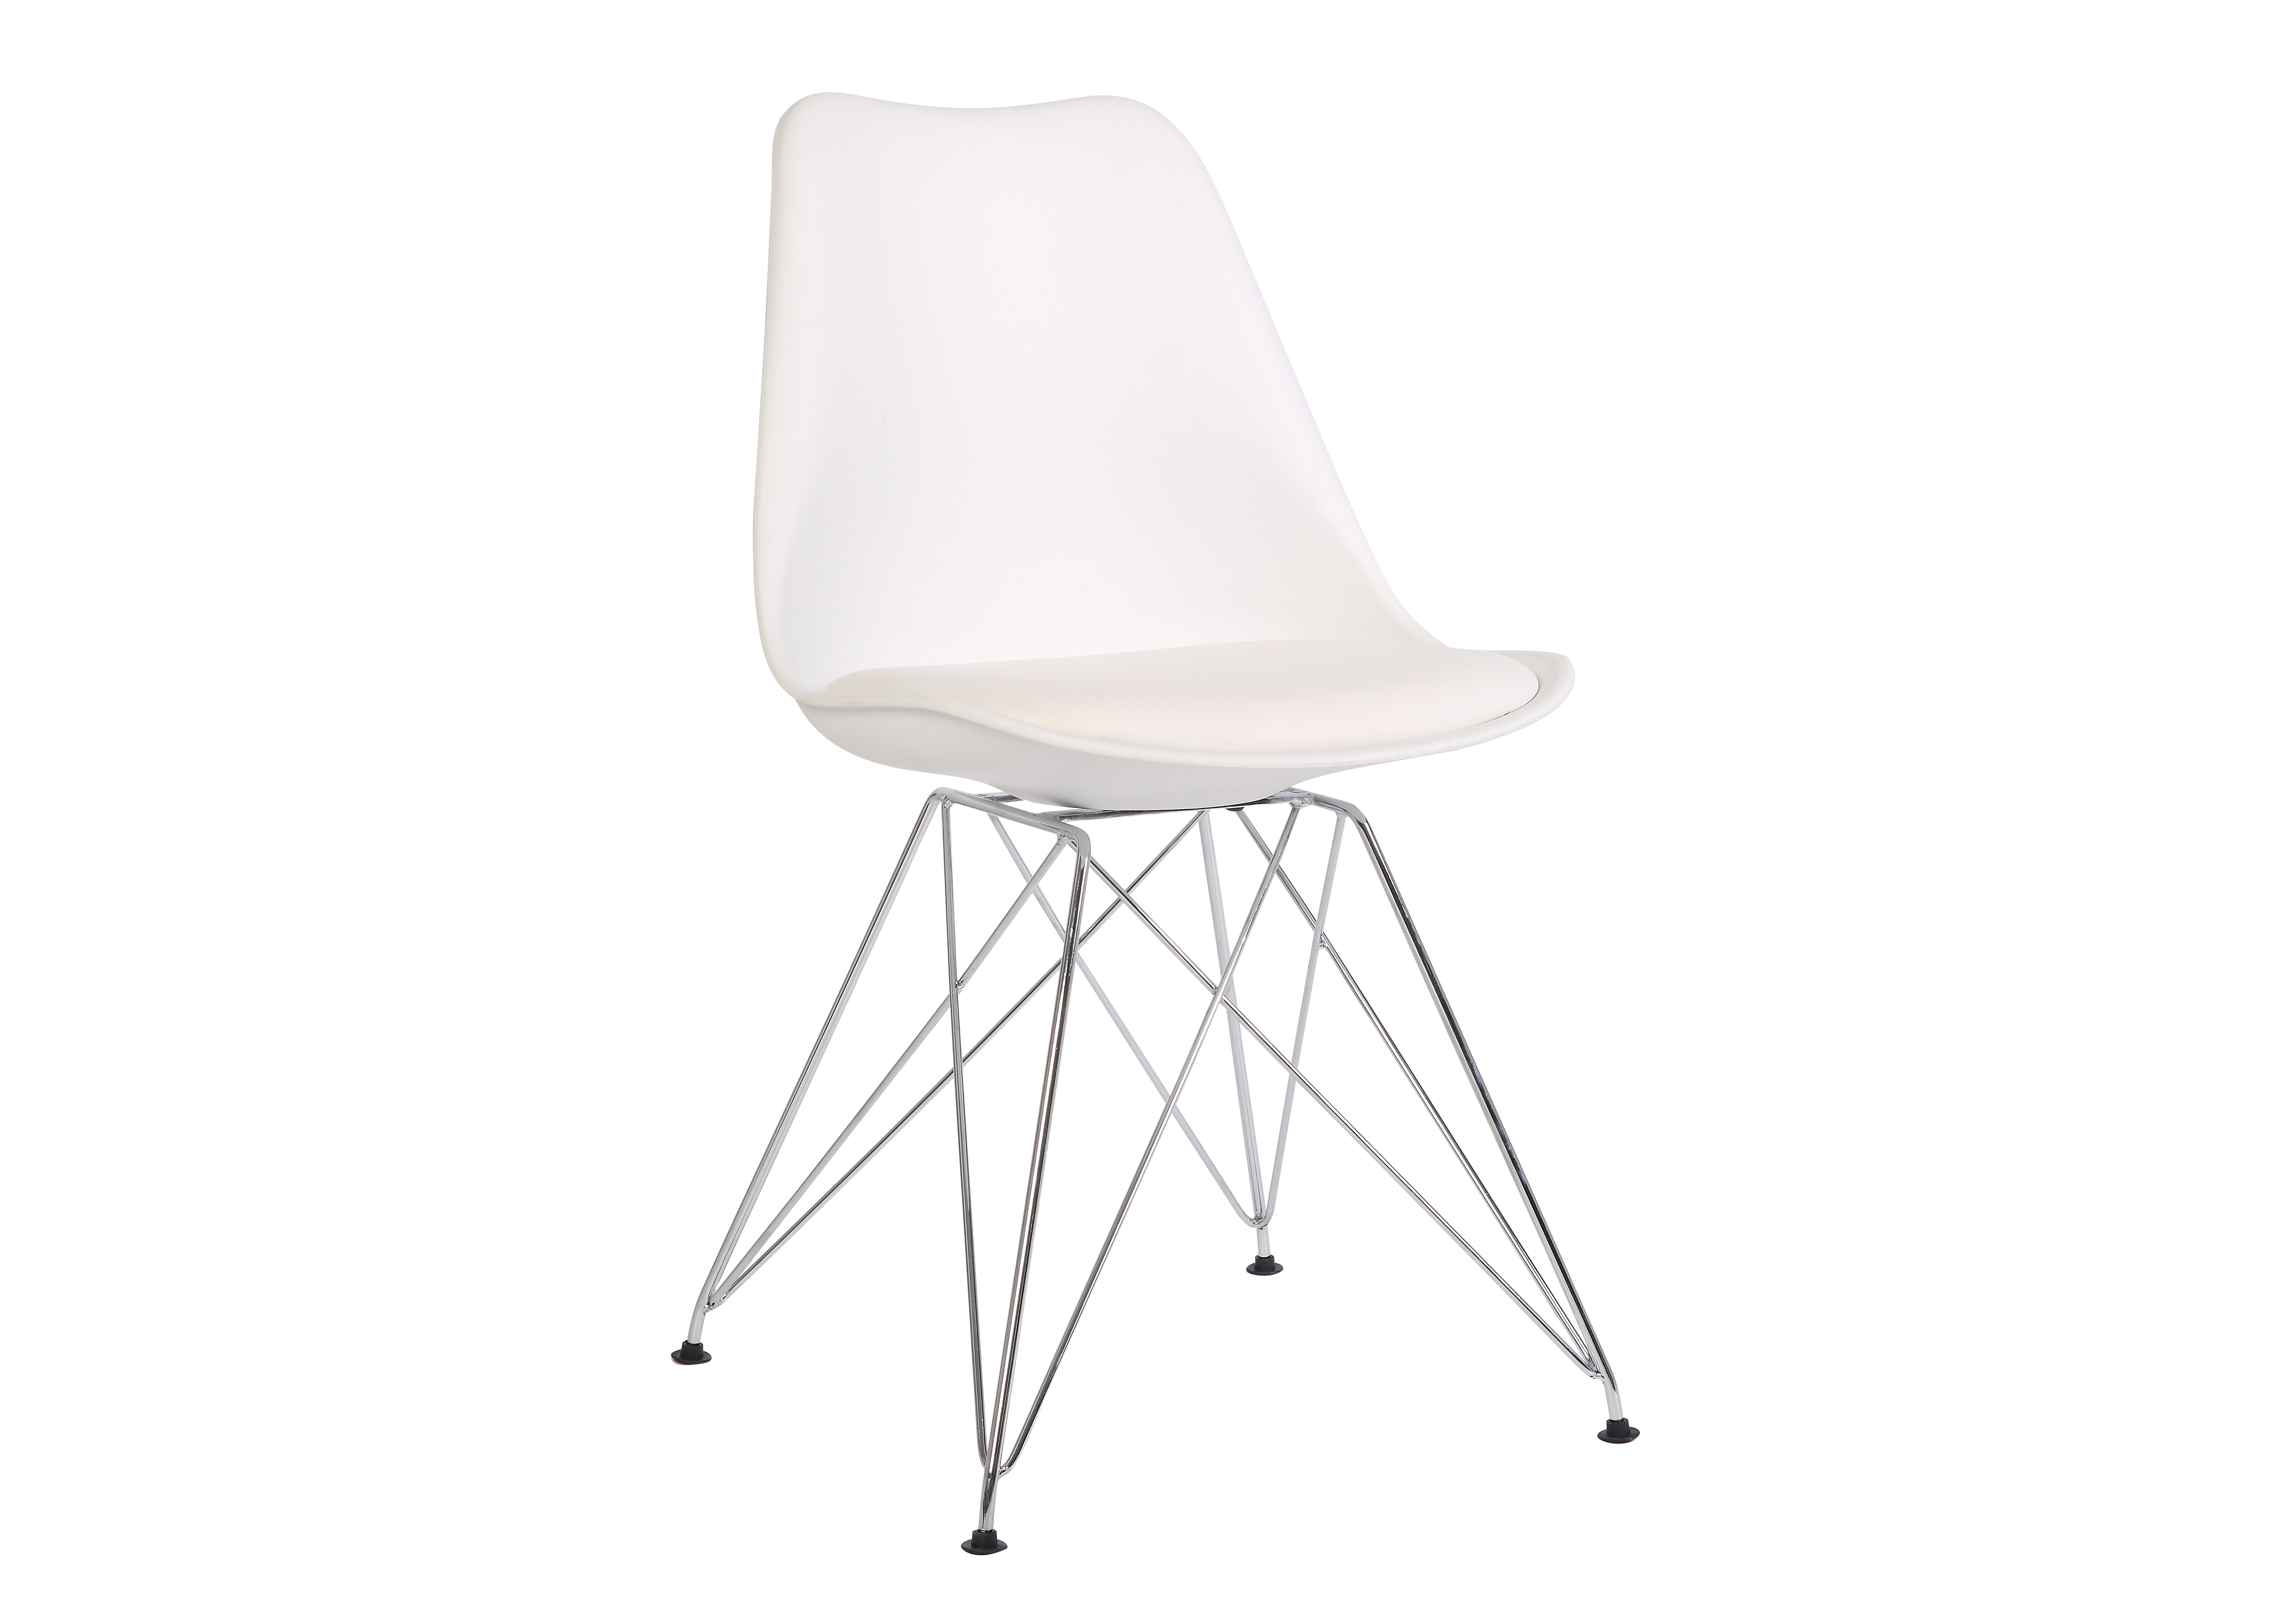 Стул JY18061 белыйОбеденные стулья<br><br><br>Material: Пластик<br>Ширина см: 48<br>Высота см: 87<br>Глубина см: 48